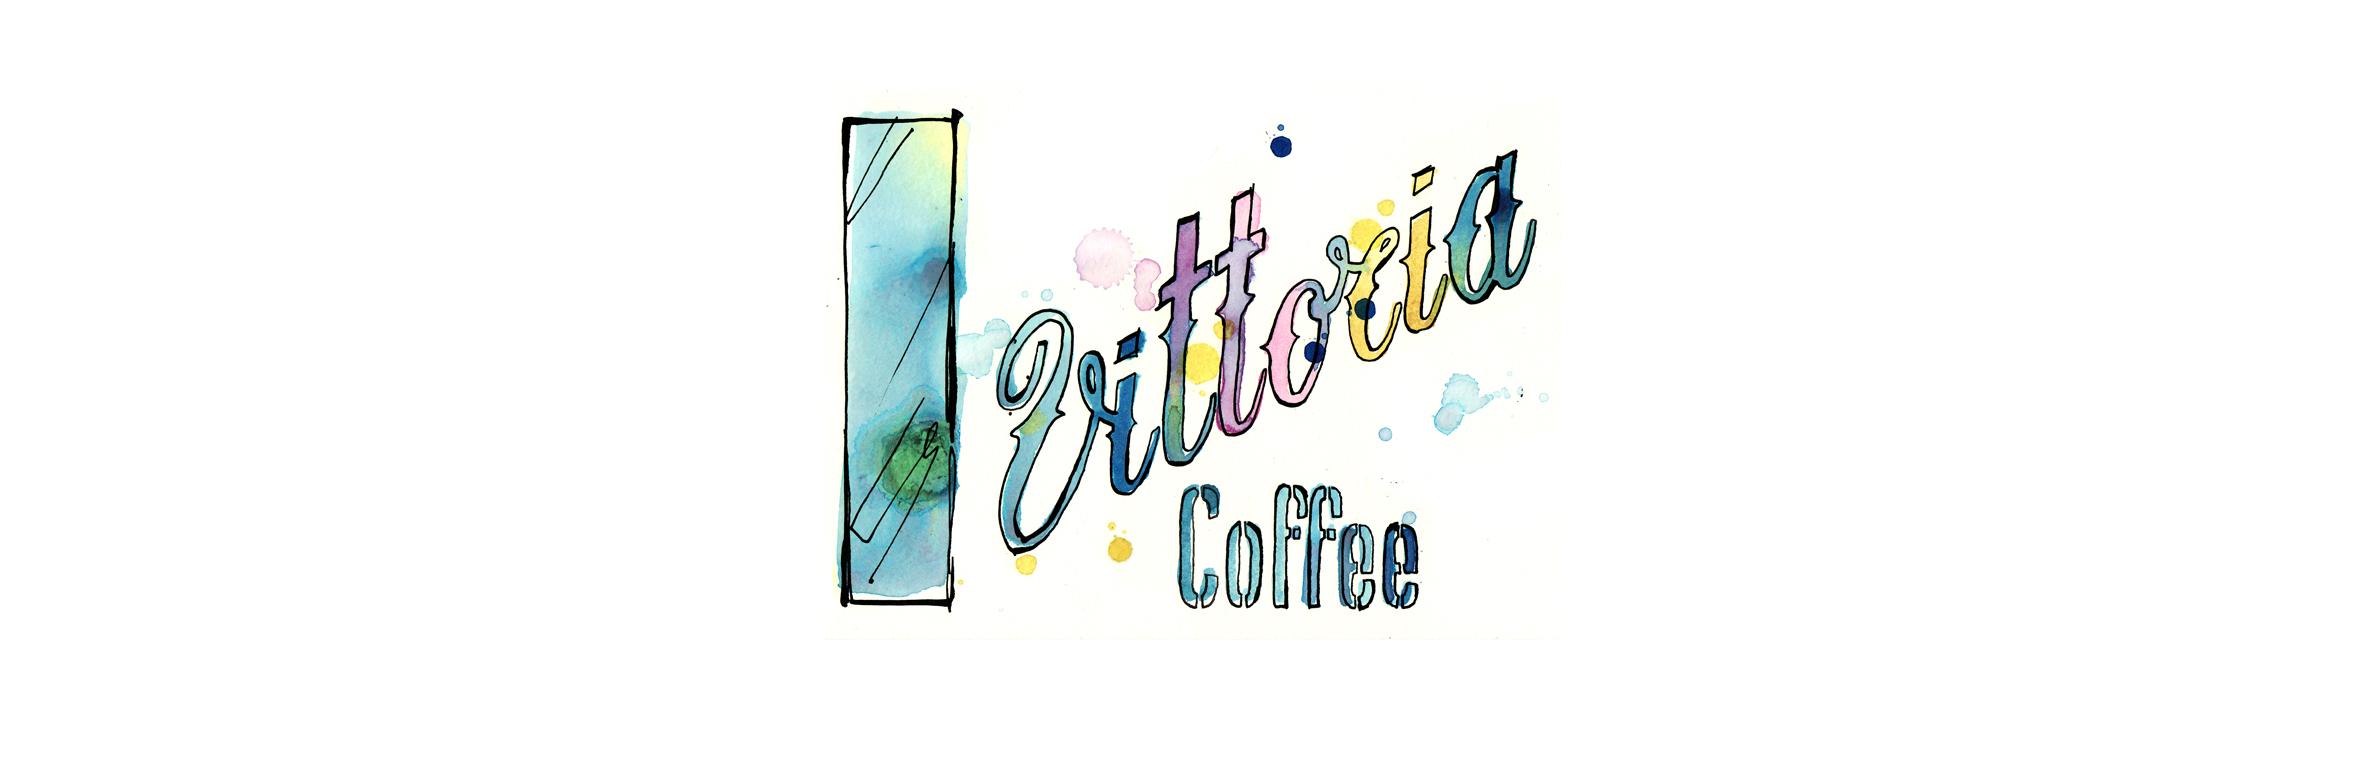 rebecca_wetzler_hand_done_typography_lettering_ink_font_branding_santa_vittoria_coffee_logo.jpg